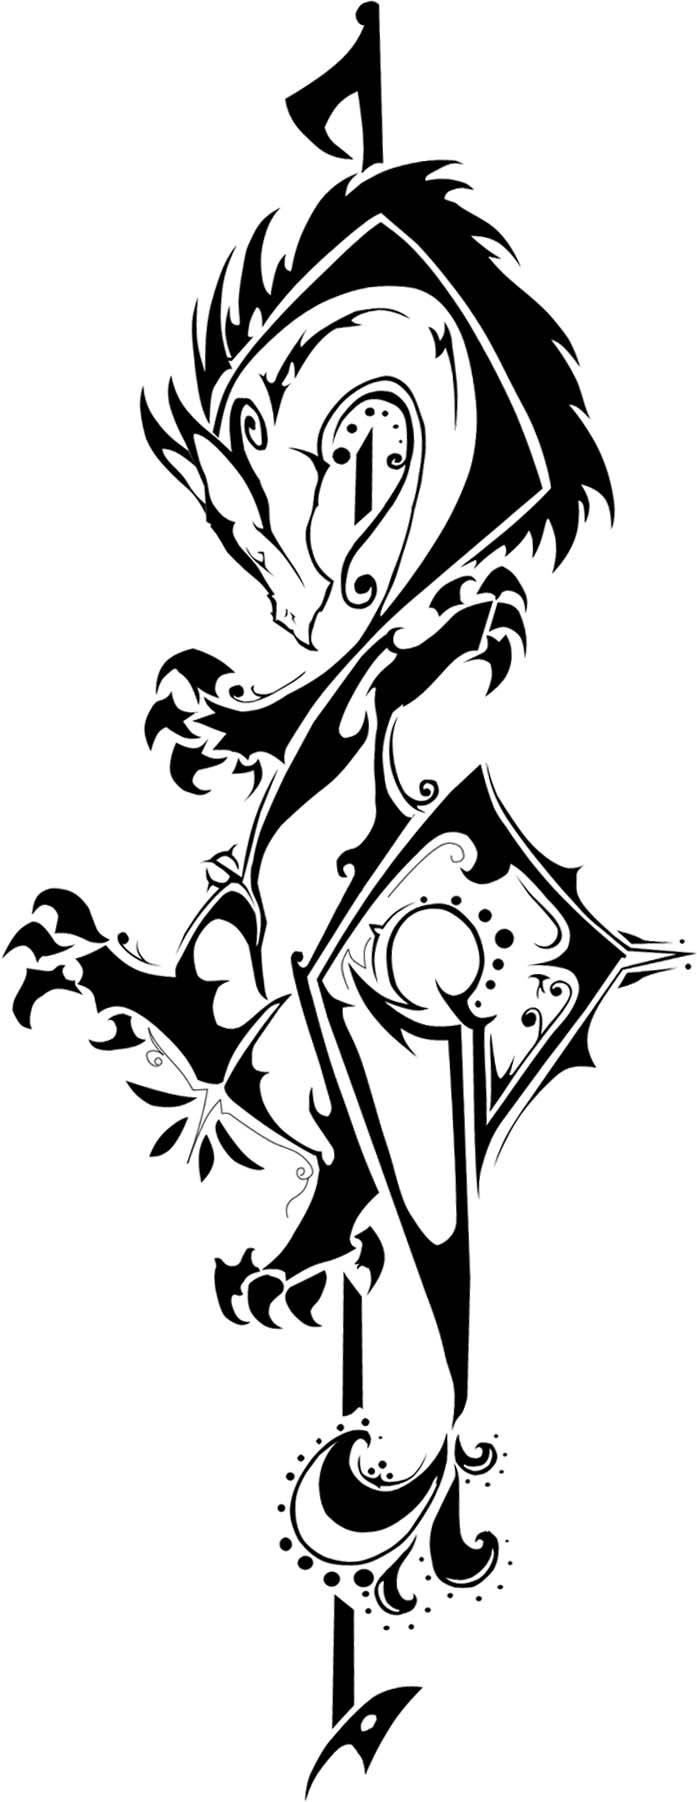 pin tribal bass clef tattoo 72152jpeg on pinterest. Black Bedroom Furniture Sets. Home Design Ideas